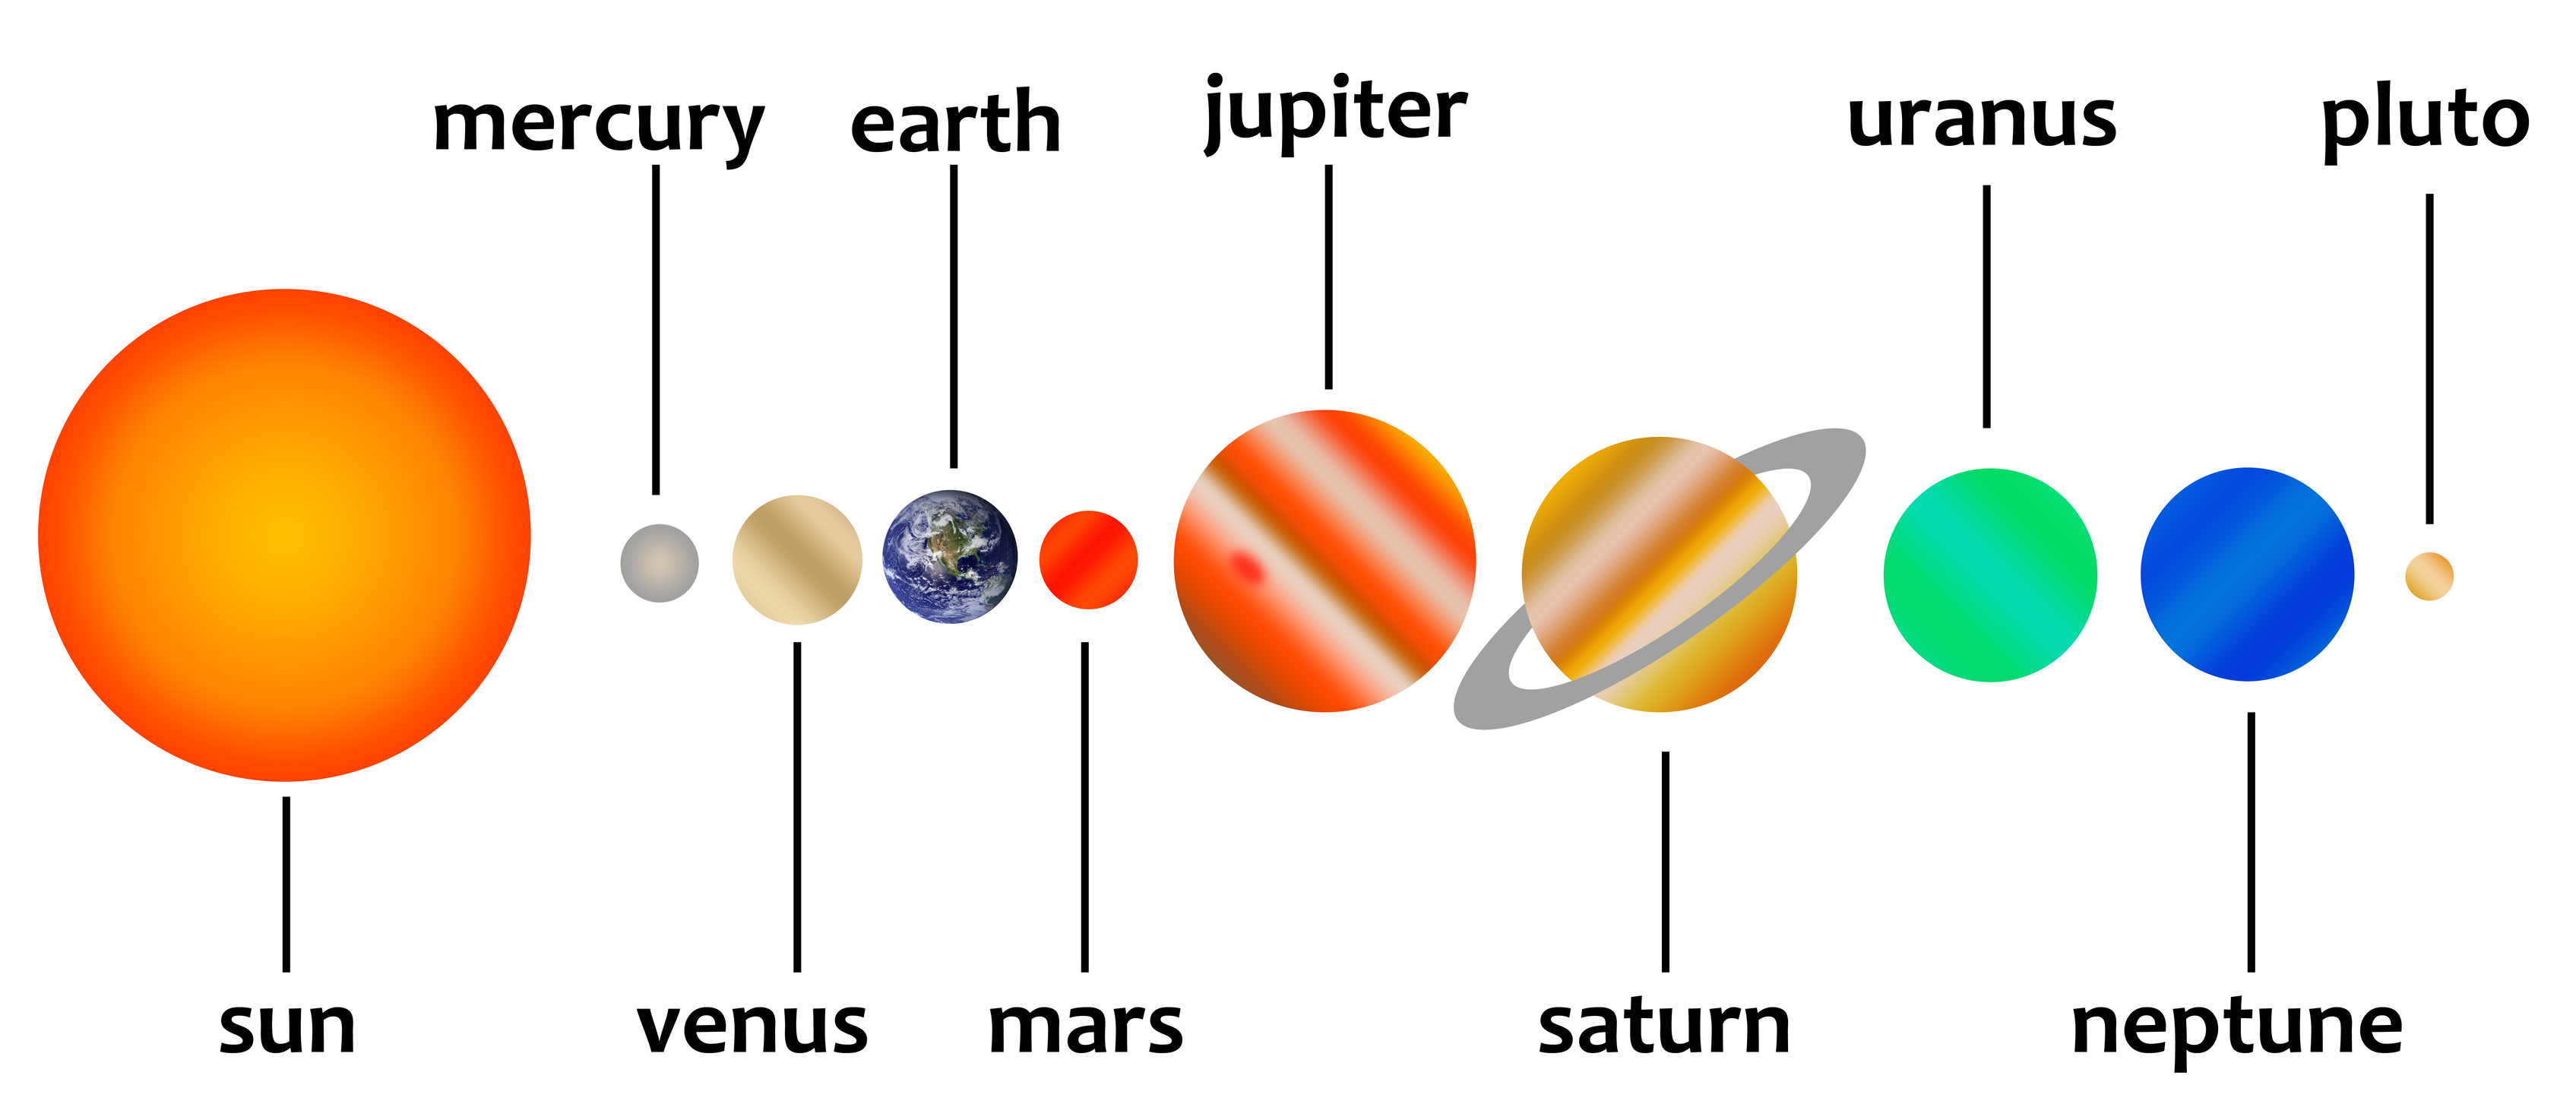 Planets In The Solar System Kidspressmag-Planets In The Solar System Kidspressmagazine Com-3